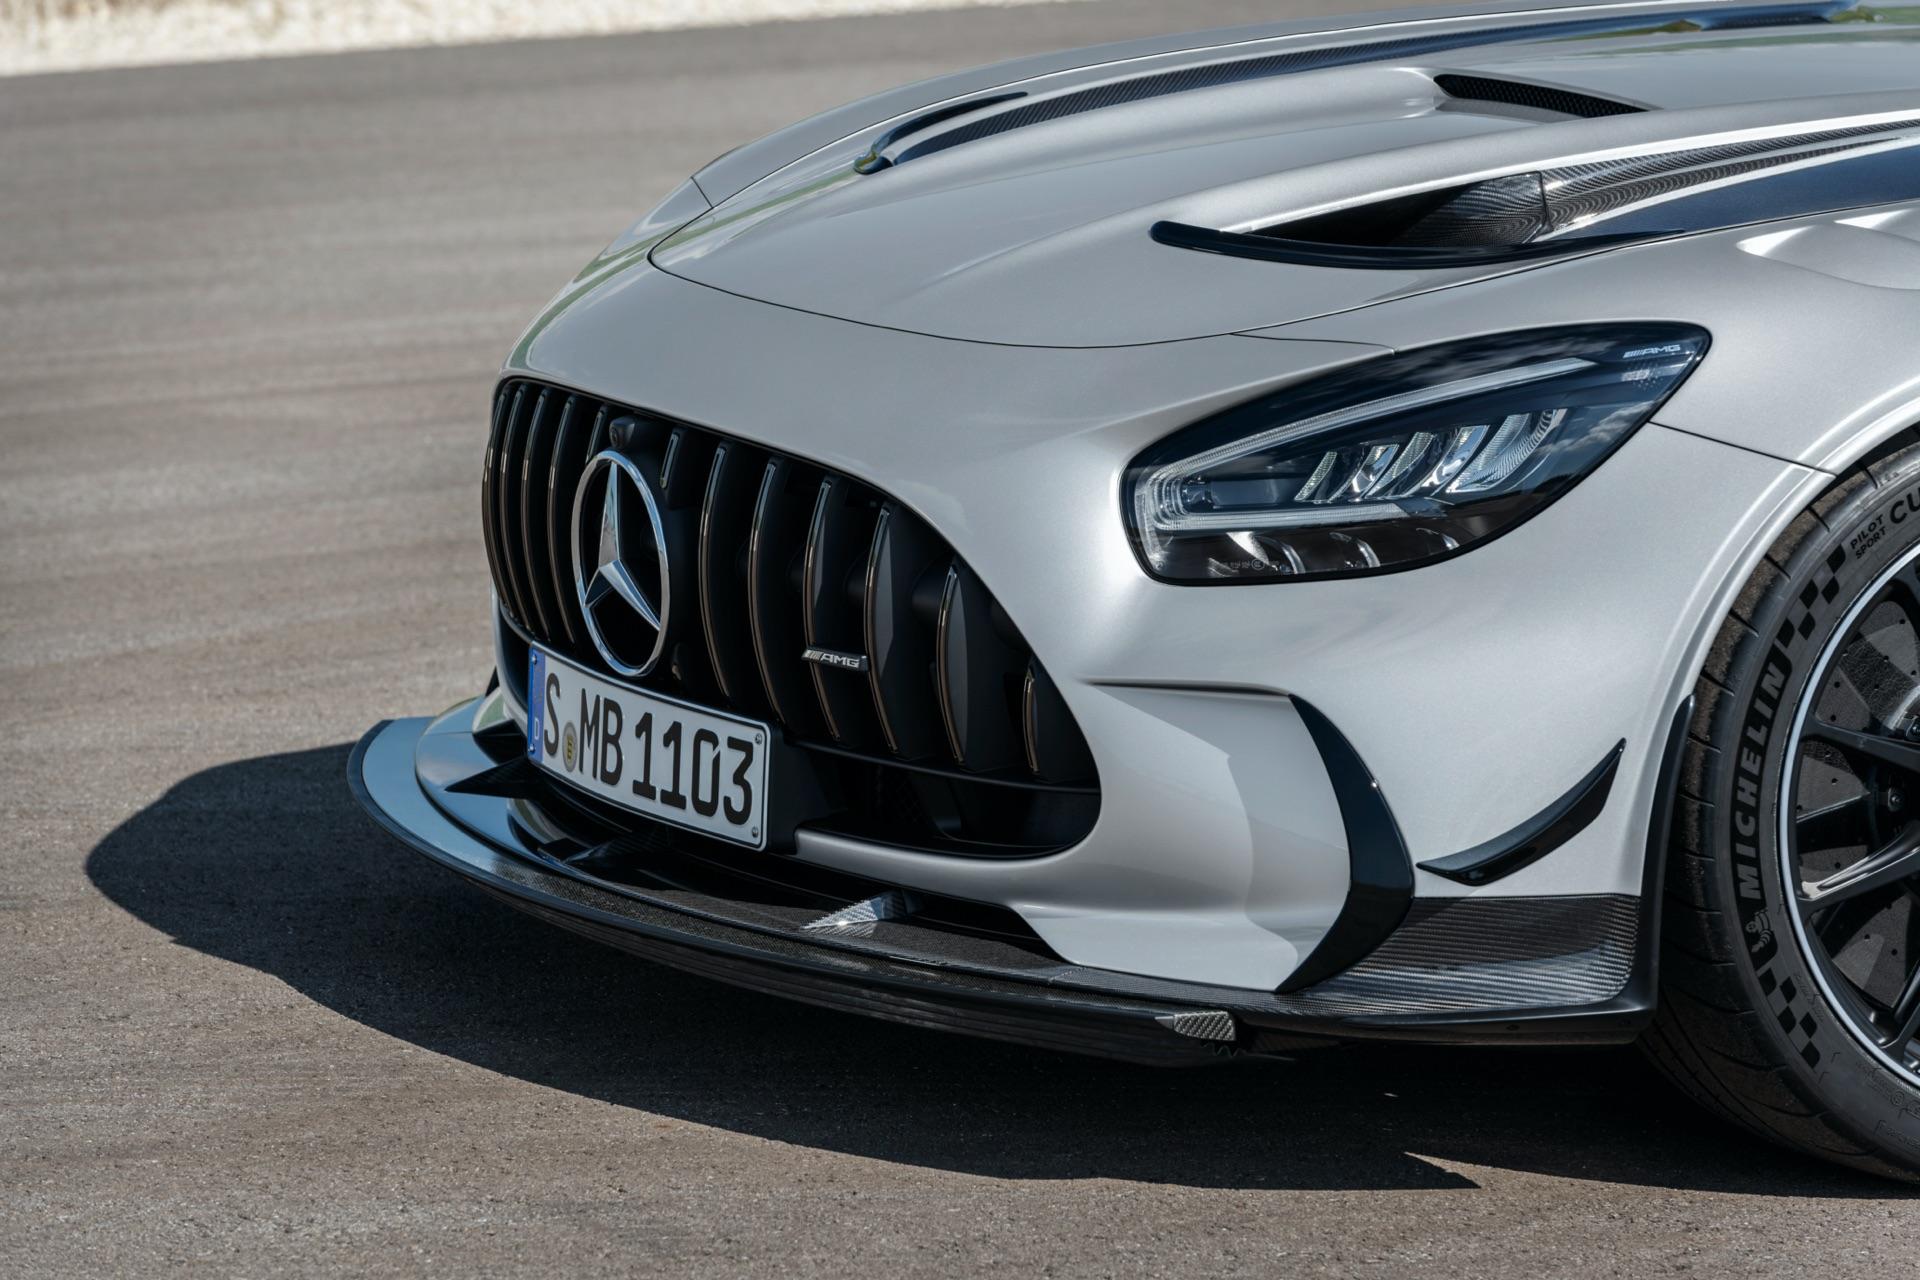 Mercedes-AMG GT Black Series Front Splitter